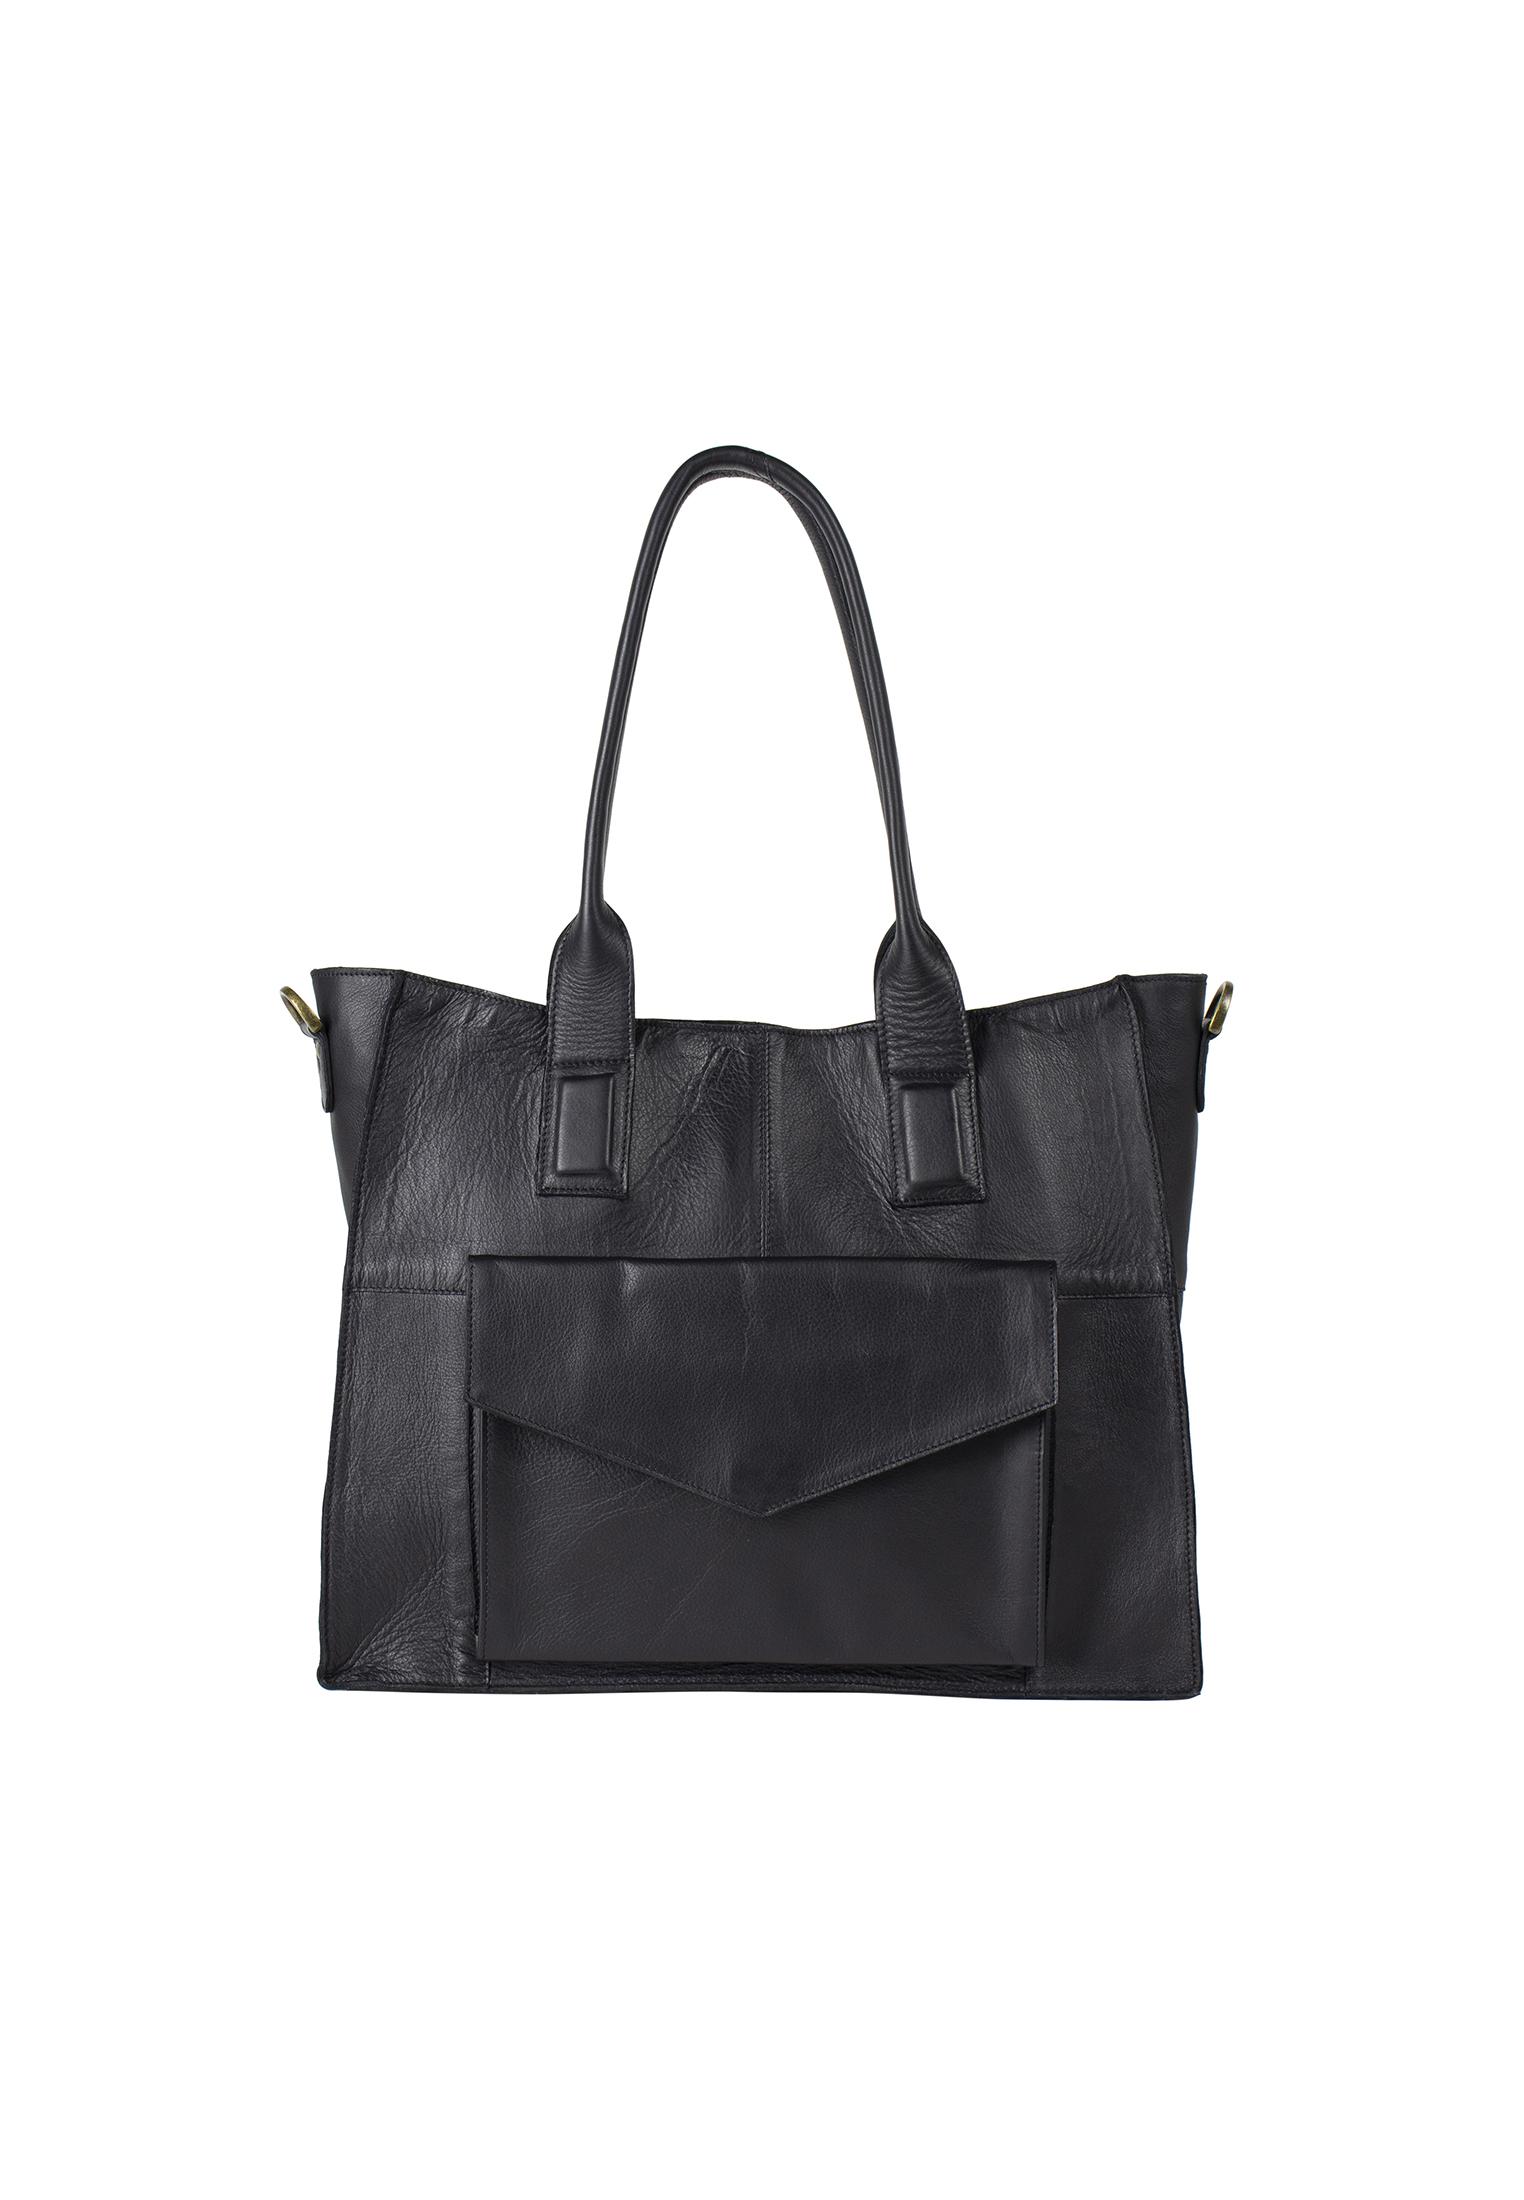 Re:Designed Otilia shopper, sort